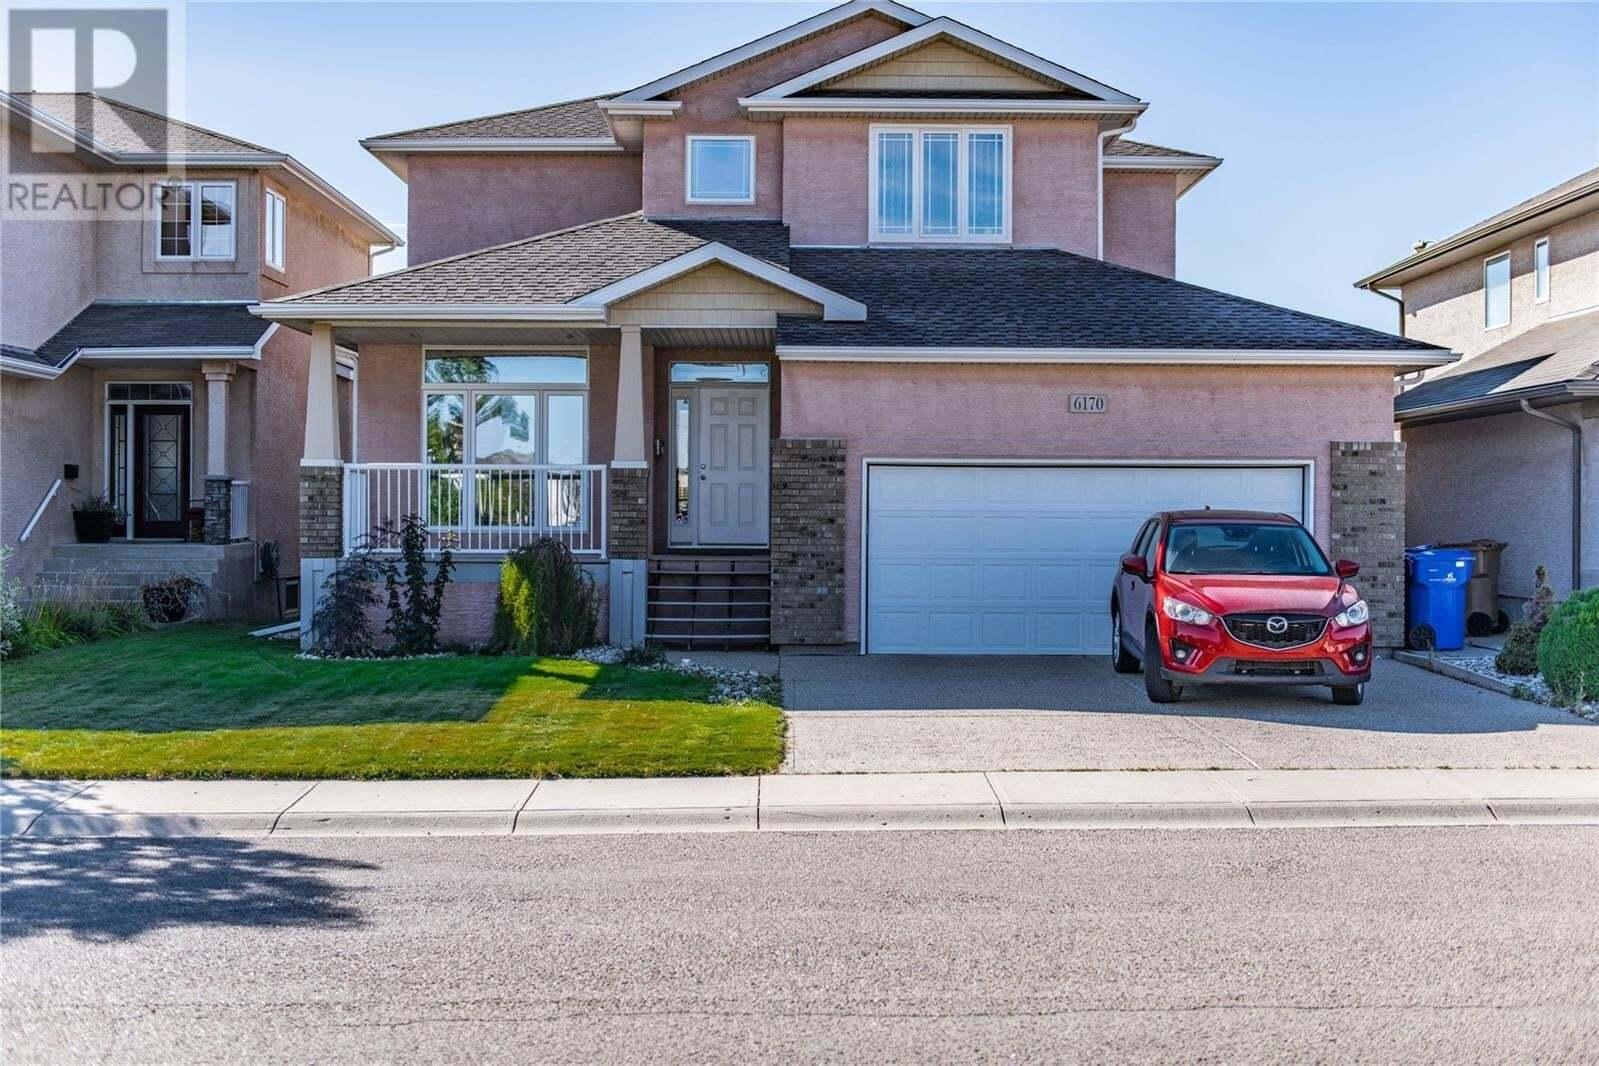 House for sale at 6170 Wascana Ct Regina Saskatchewan - MLS: SK827475